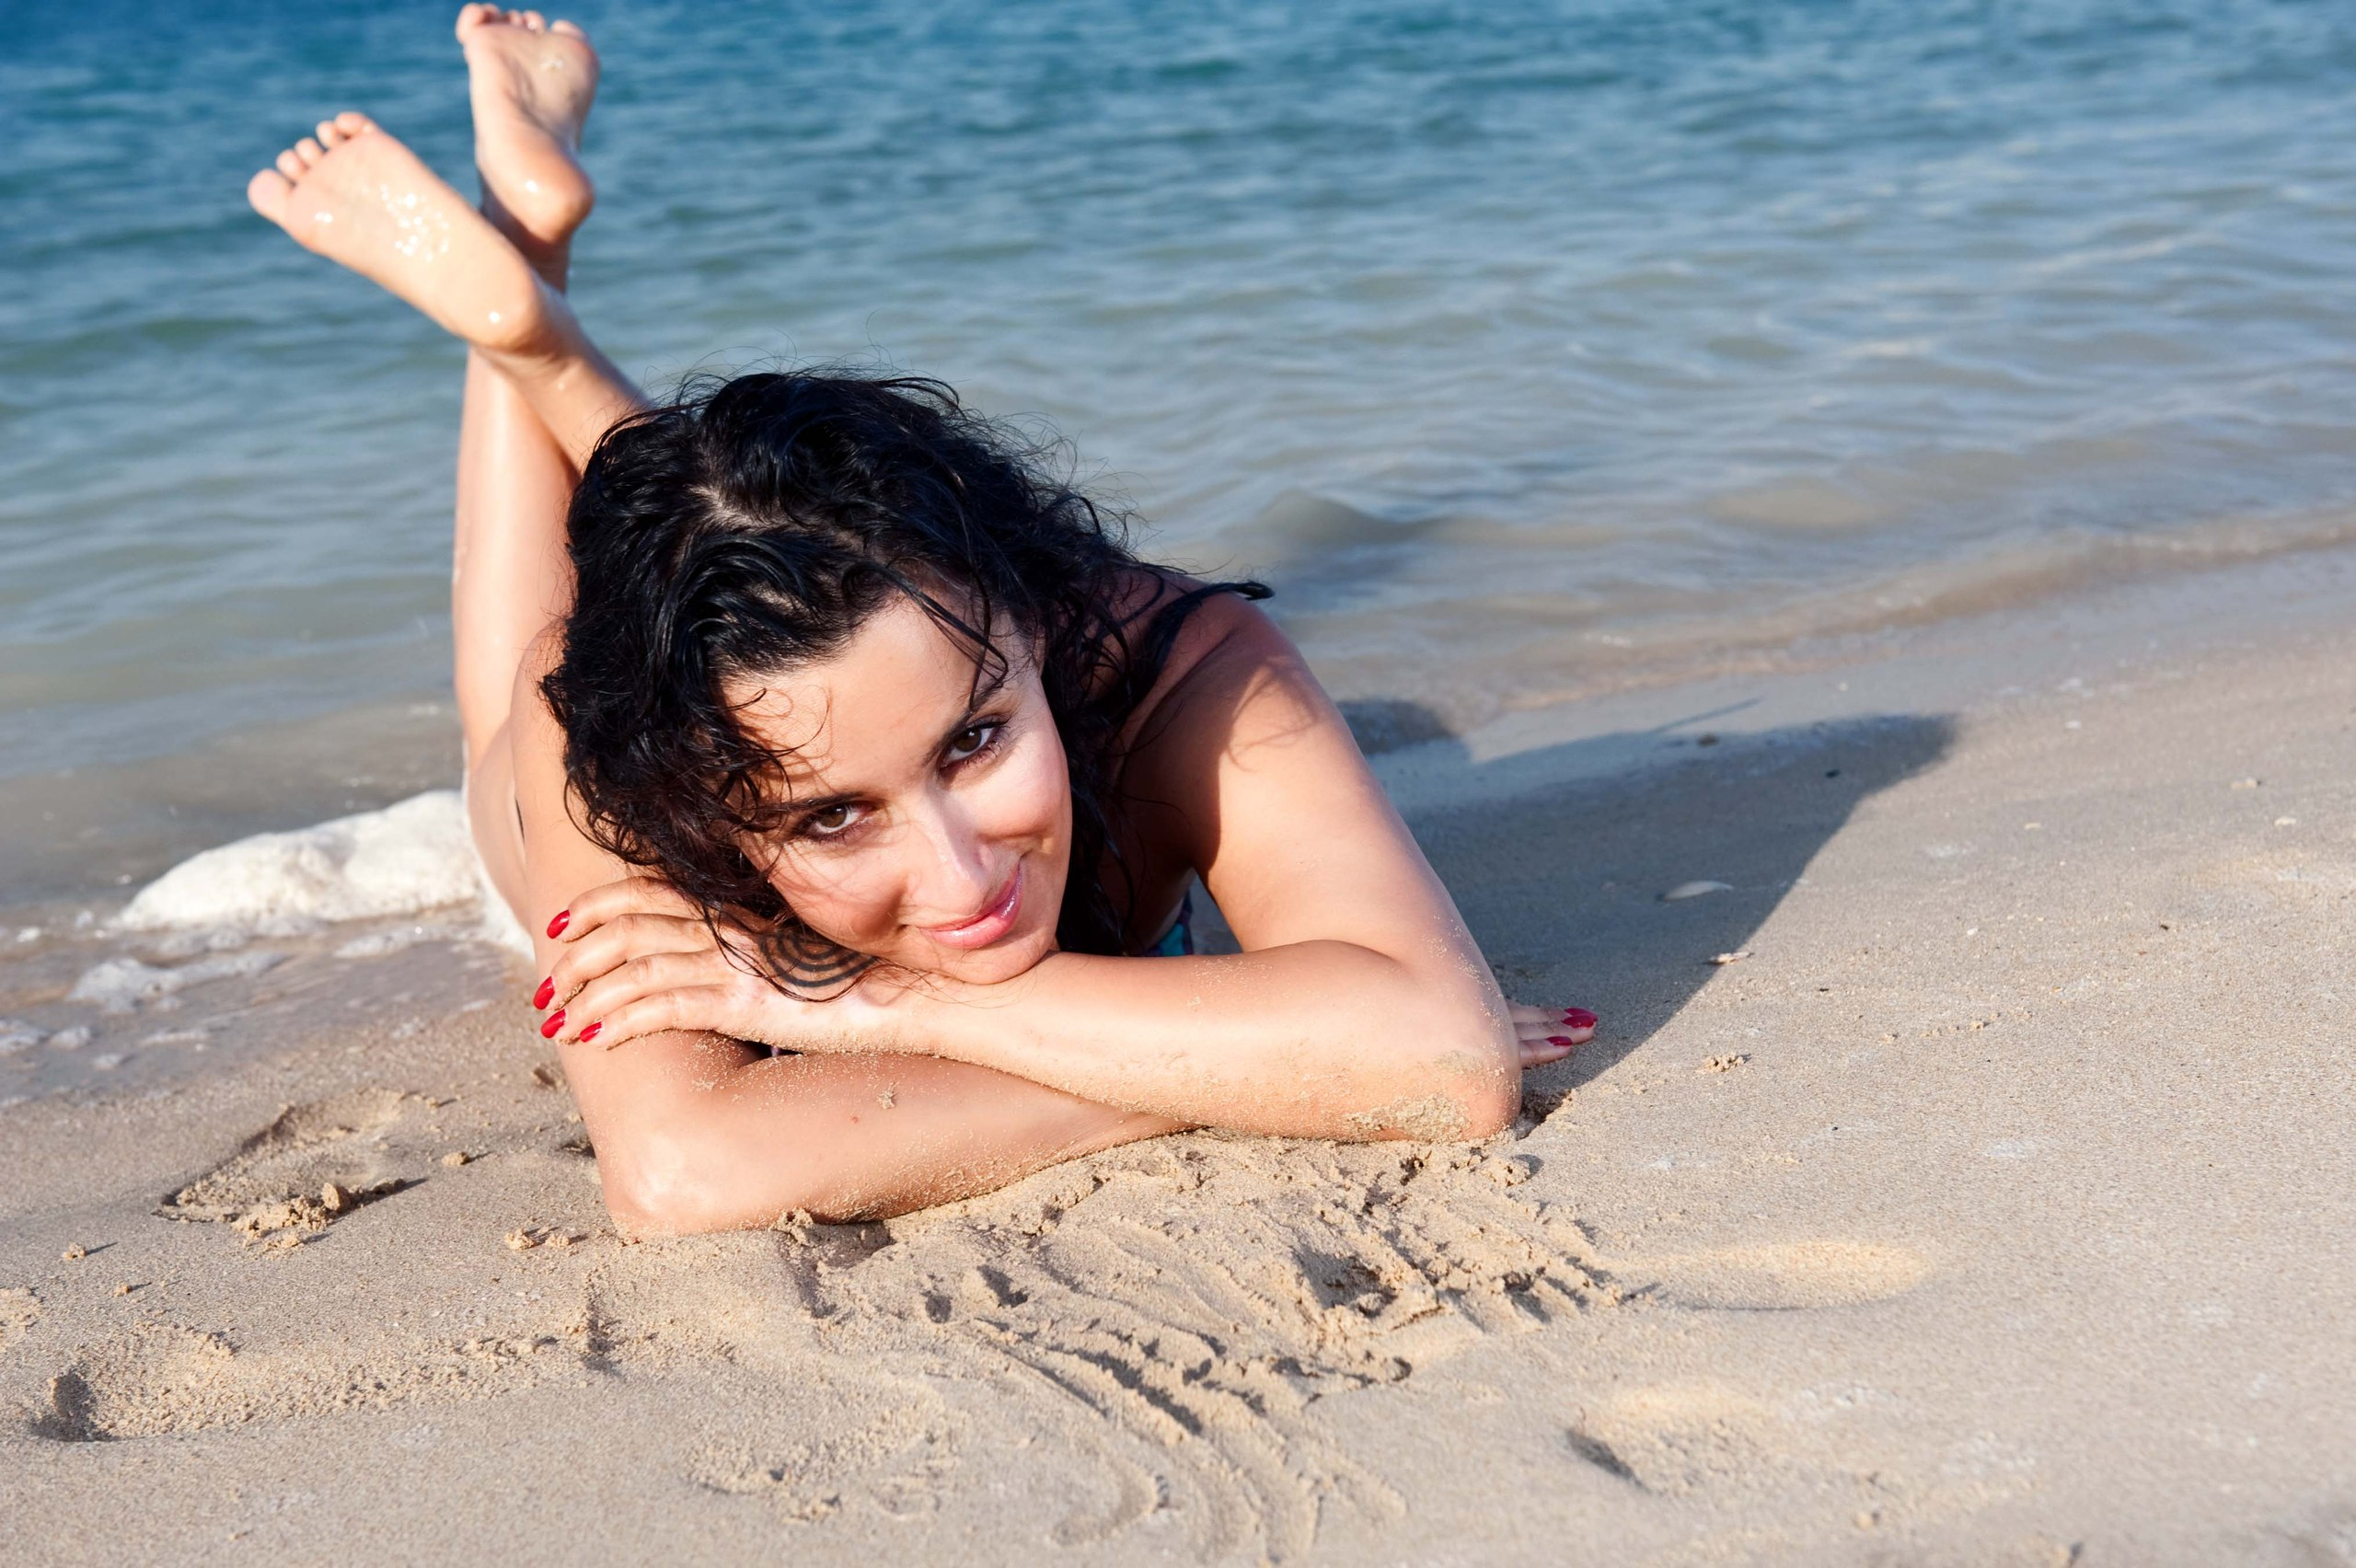 Фото тины канделаки на пляже